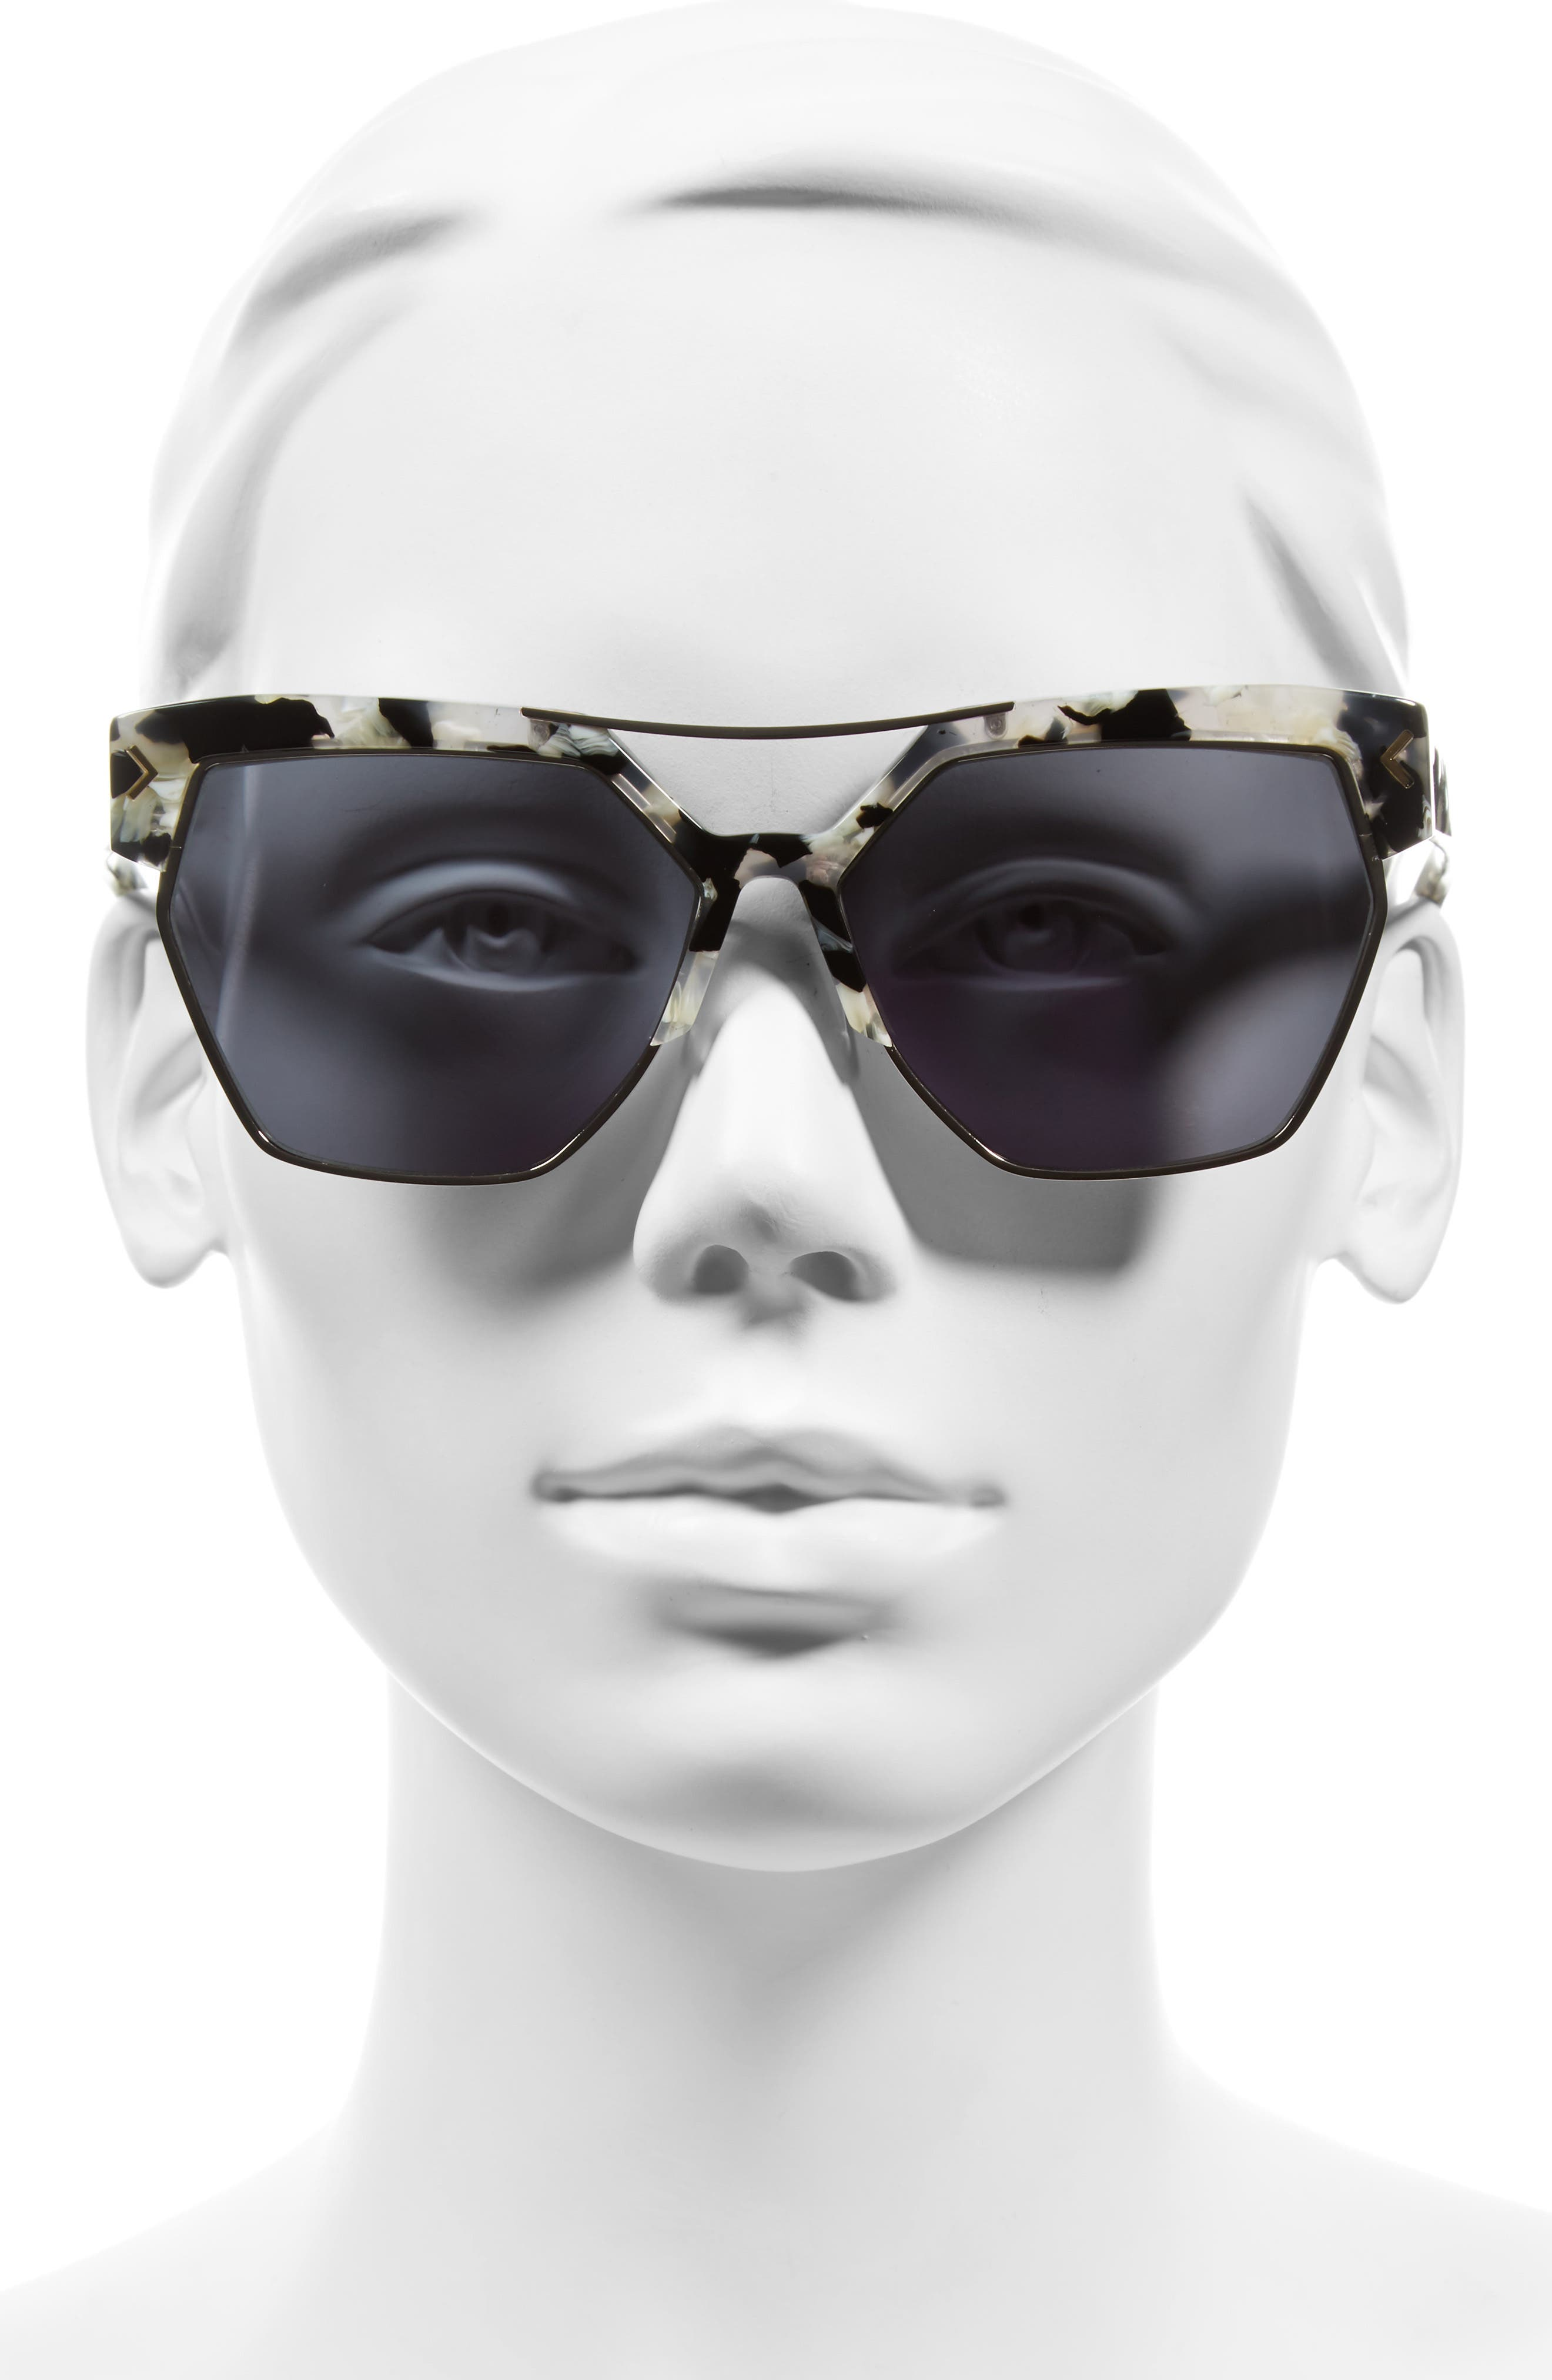 55mm Retro Sunglasses,                             Alternate thumbnail 7, color,